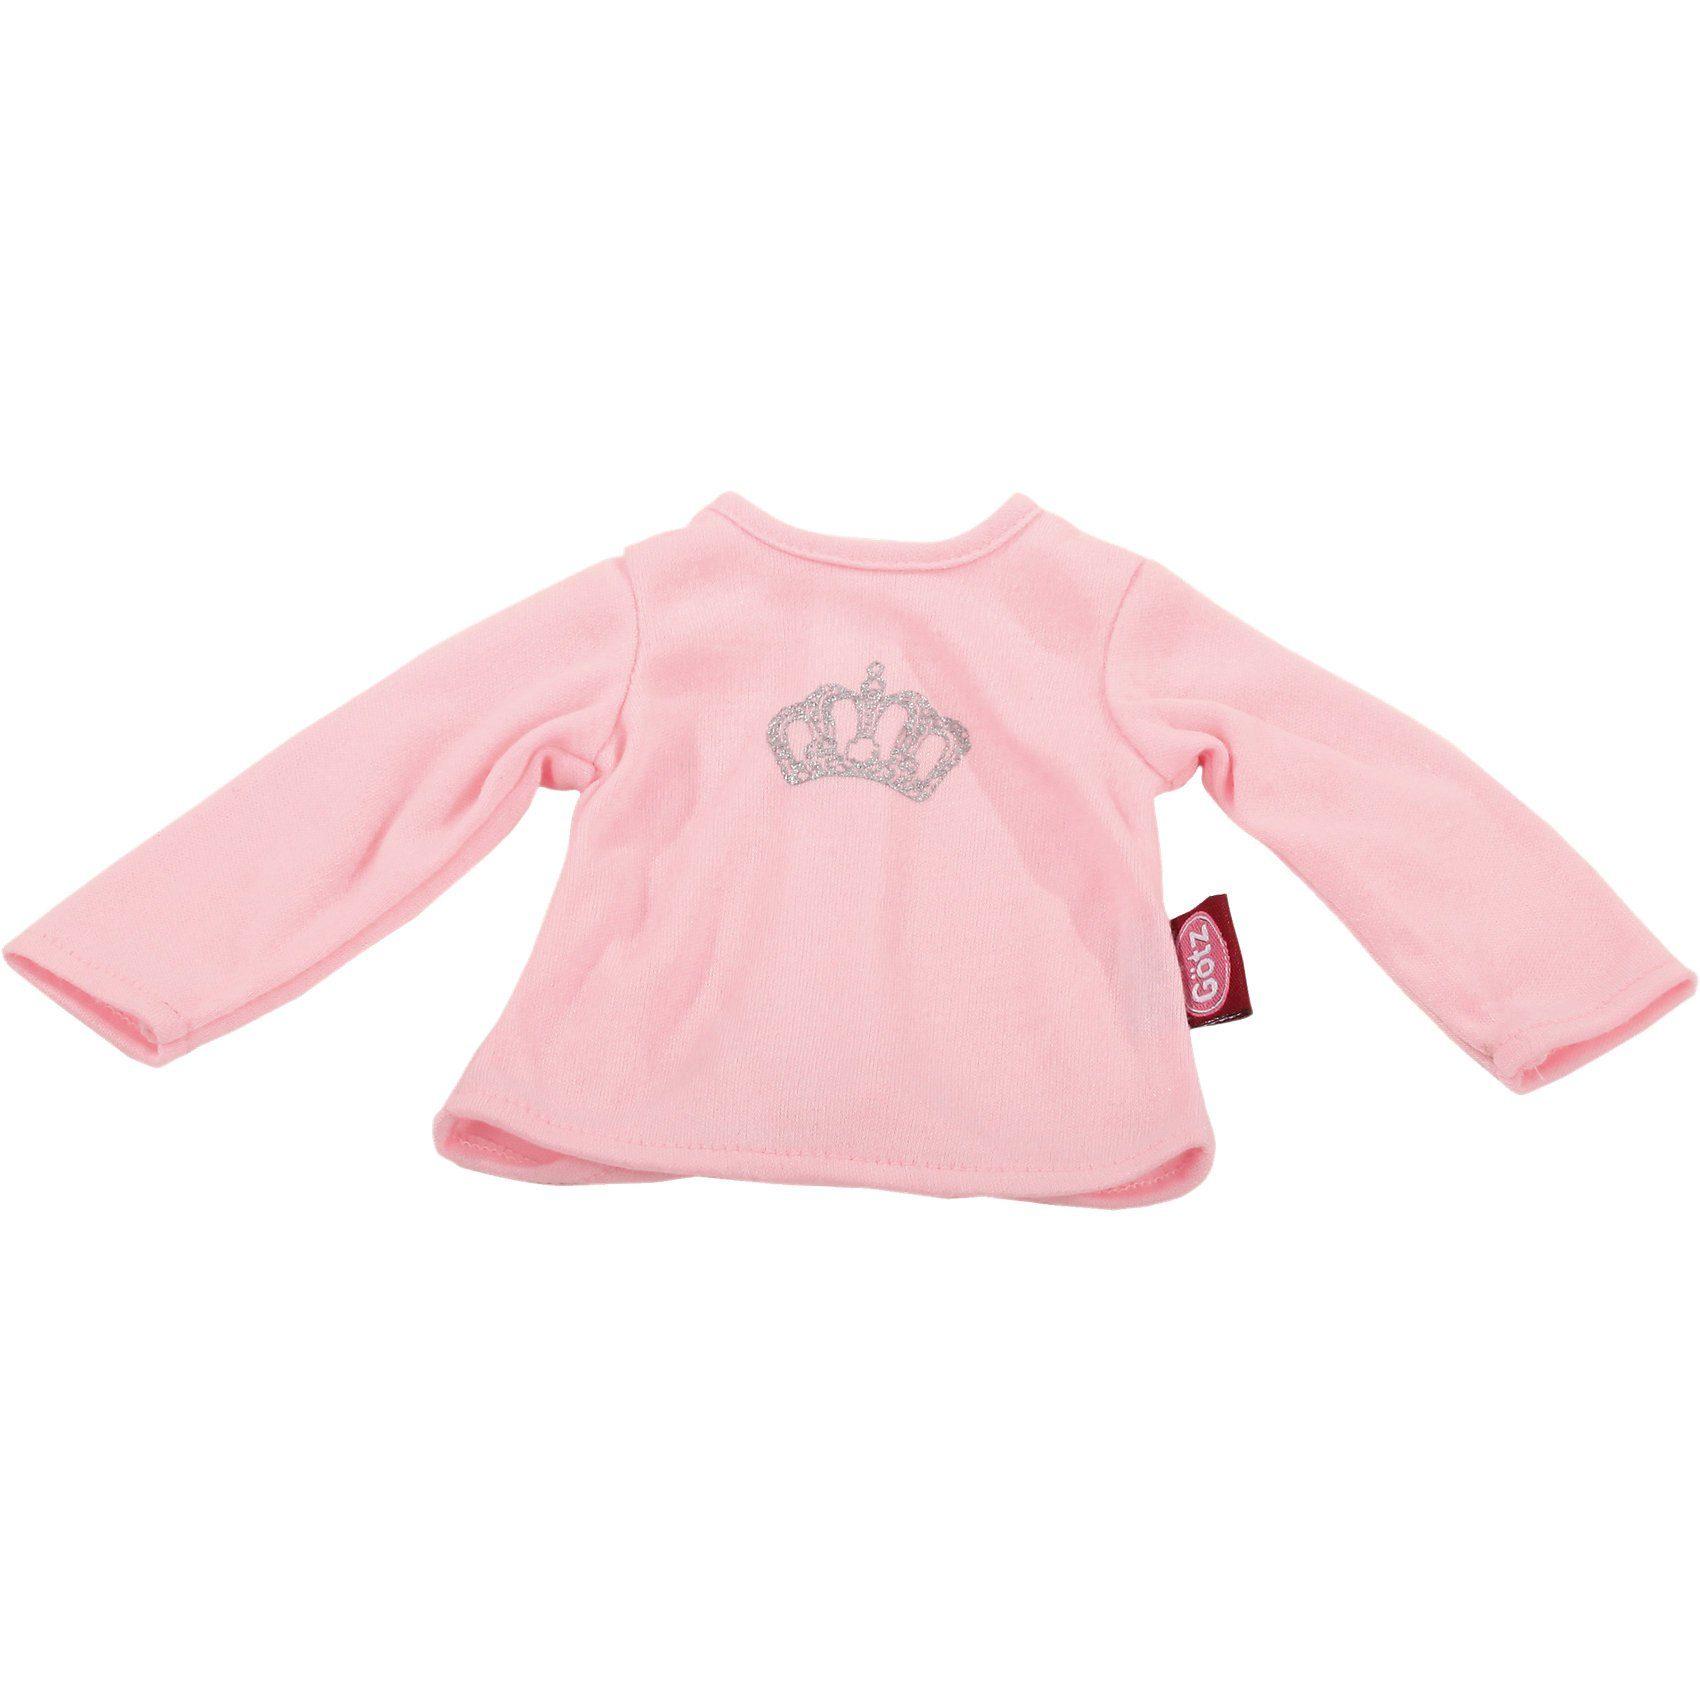 GÖTZ Puppenkleidung T-Shirt, royal 42-46 cm